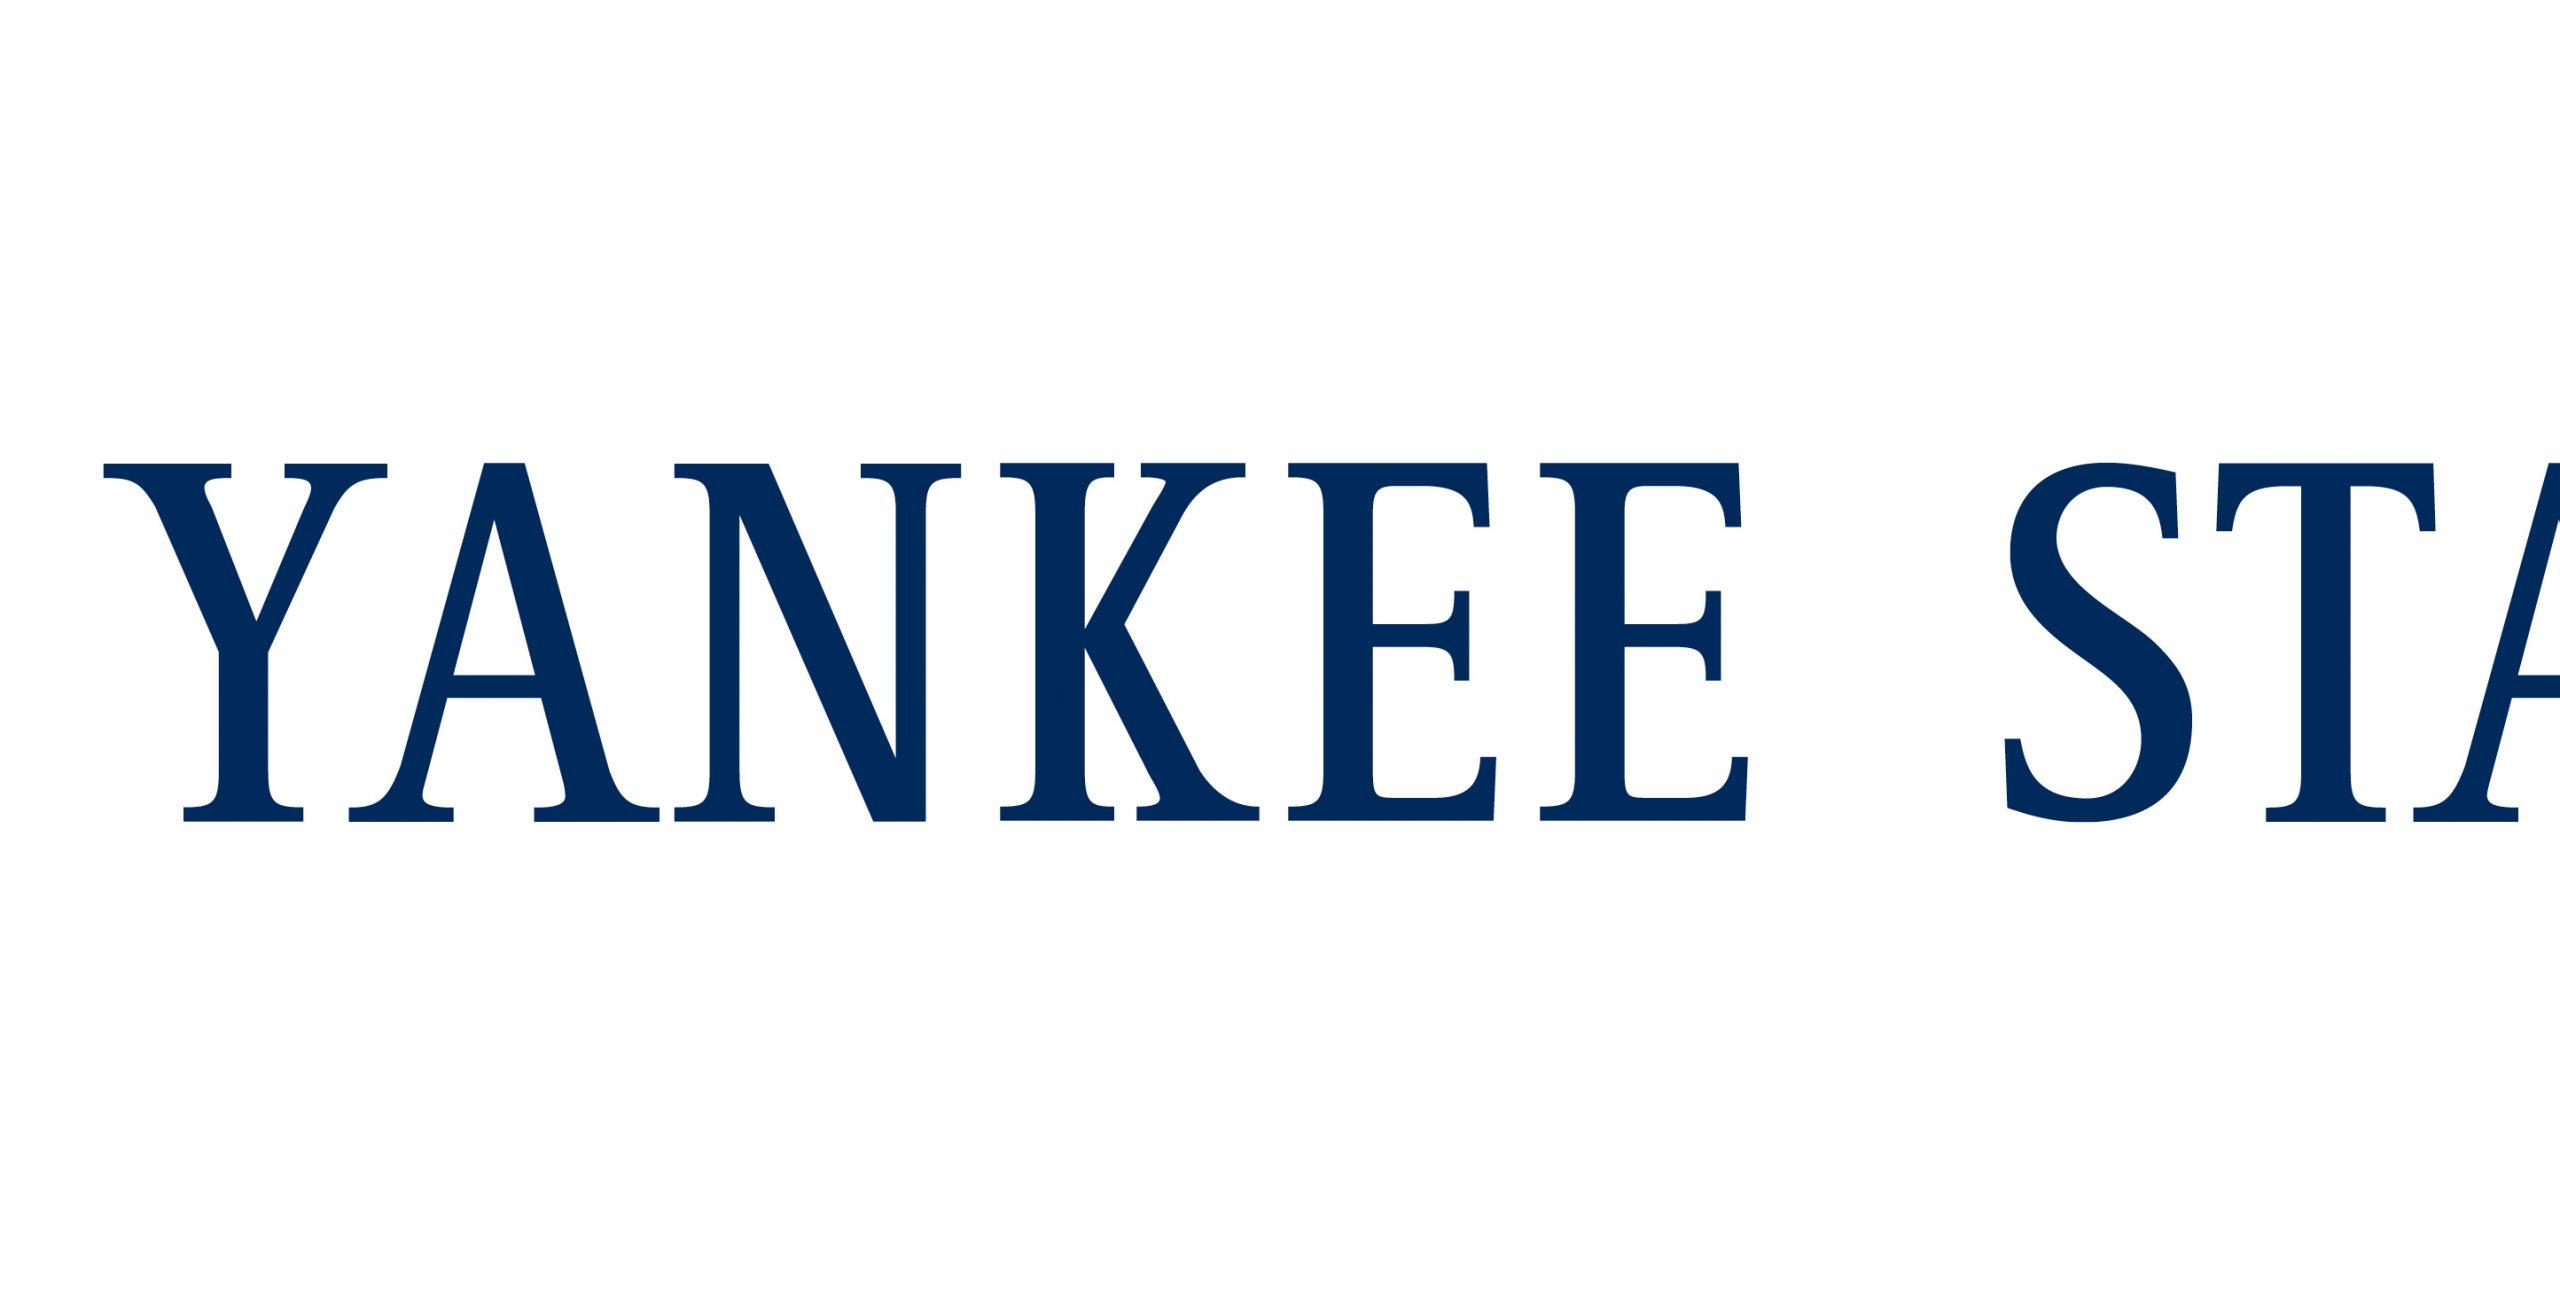 Yankee_branding